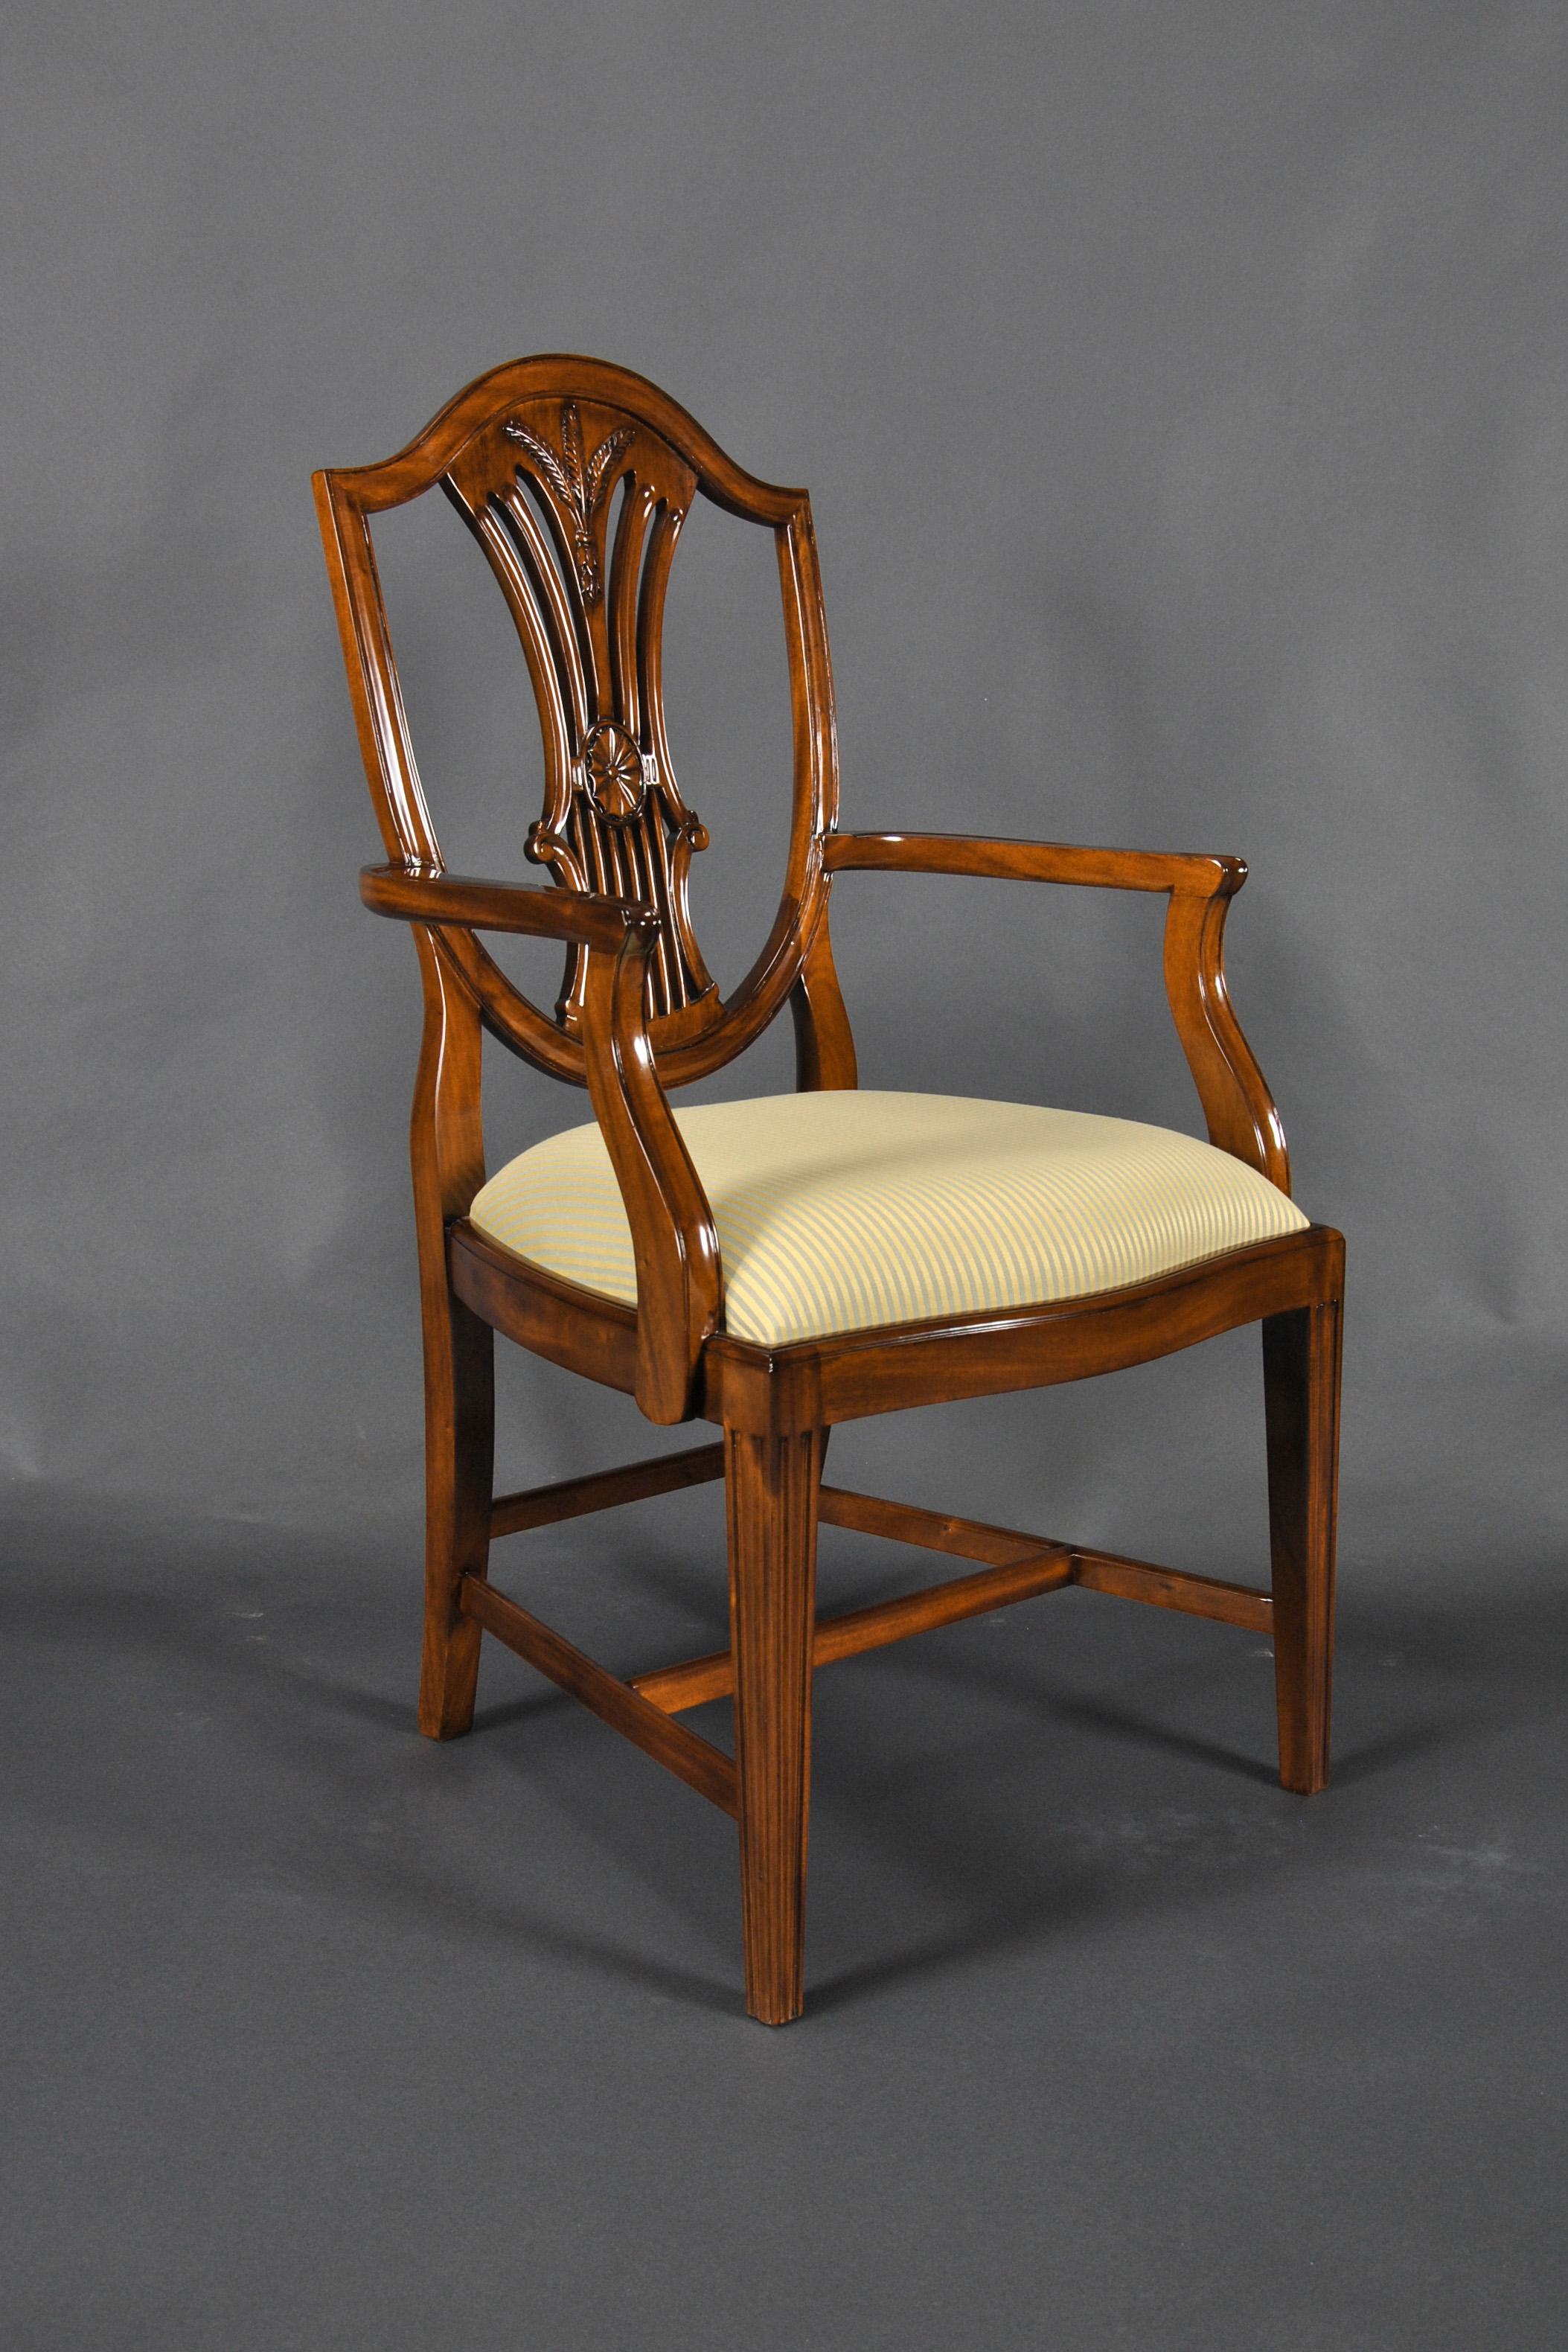 Shield Back Dining Room Arm Chair, Niagara Furniture, Free